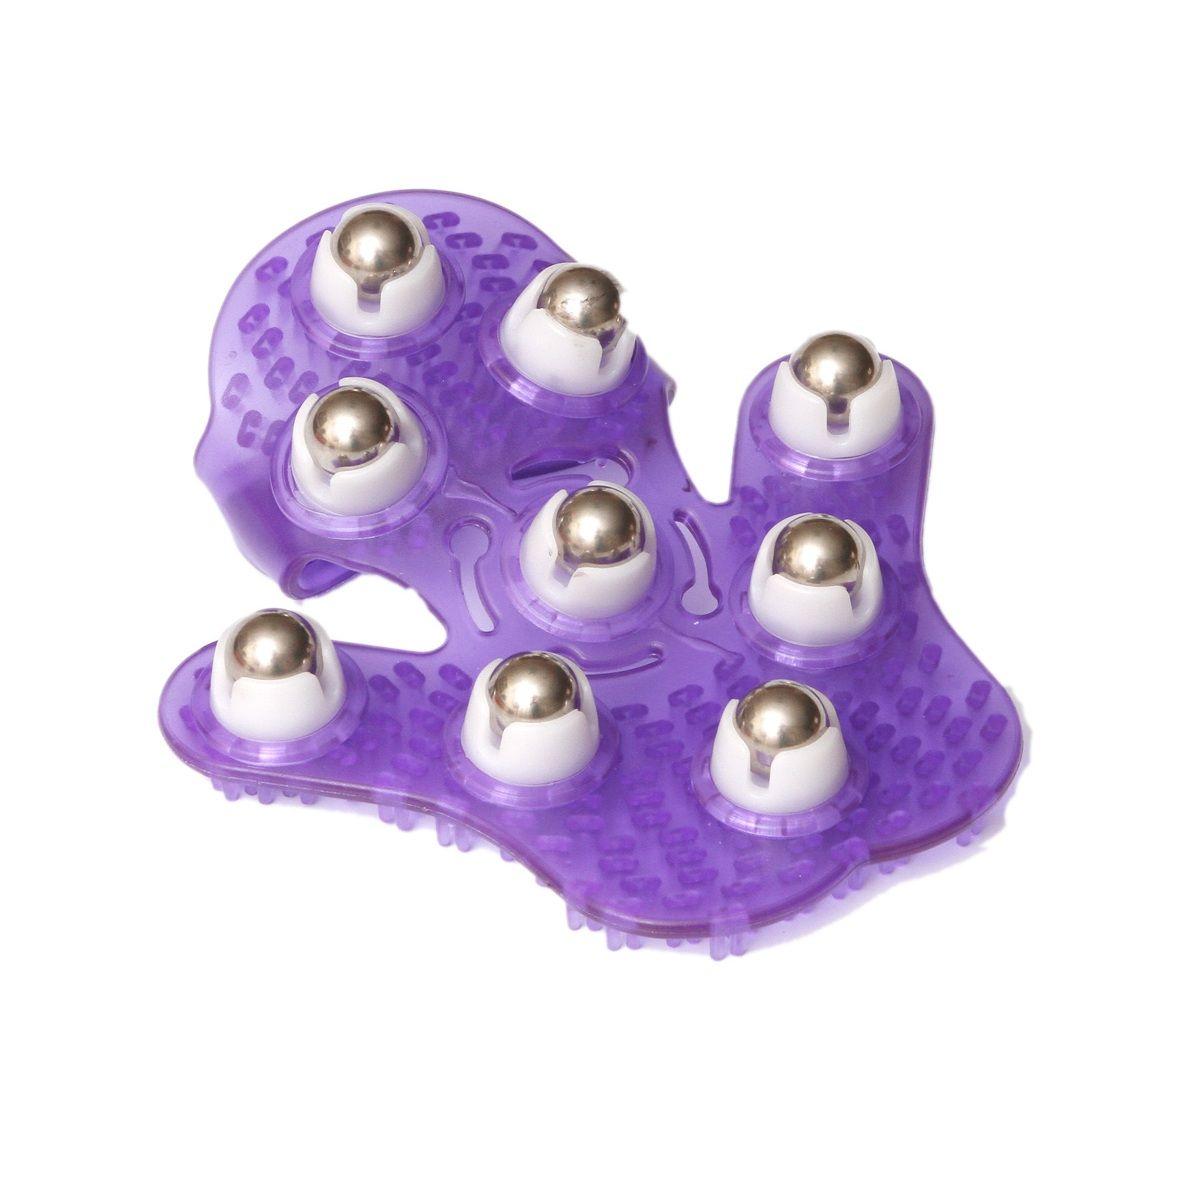 Luva Com Esferas para Massagem Estek